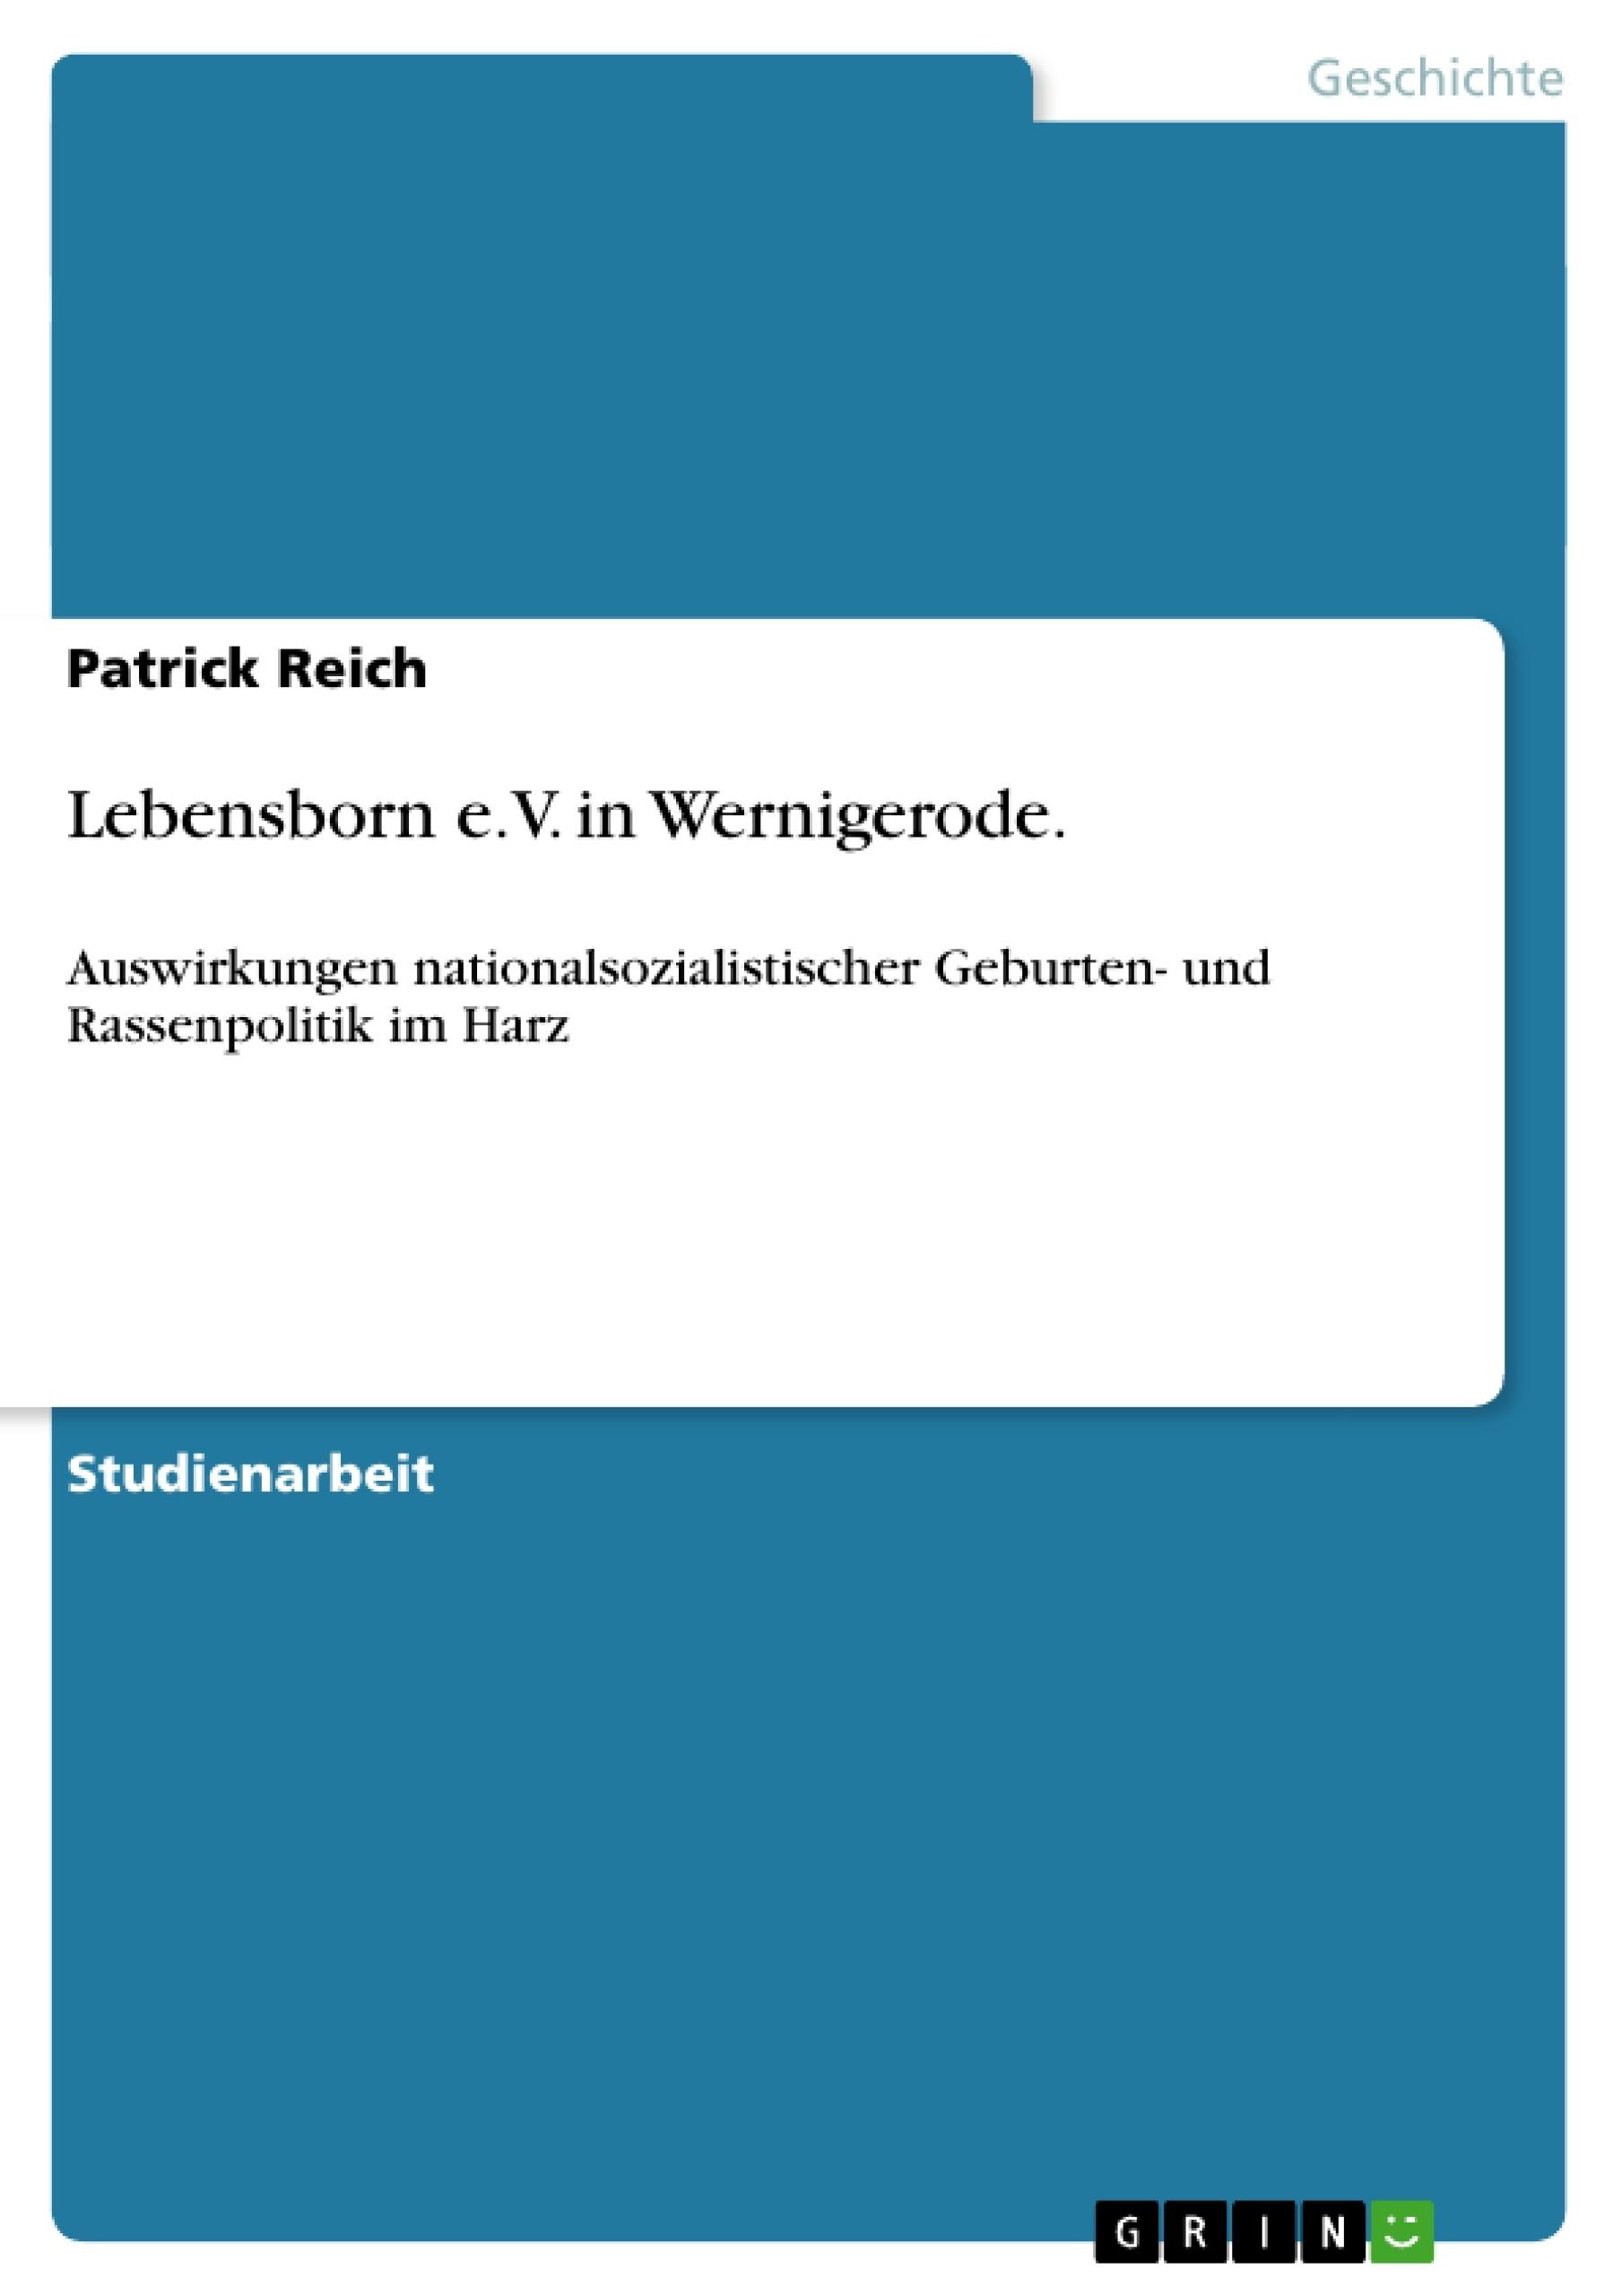 Titel: Lebensborn e.V. in Wernigerode.